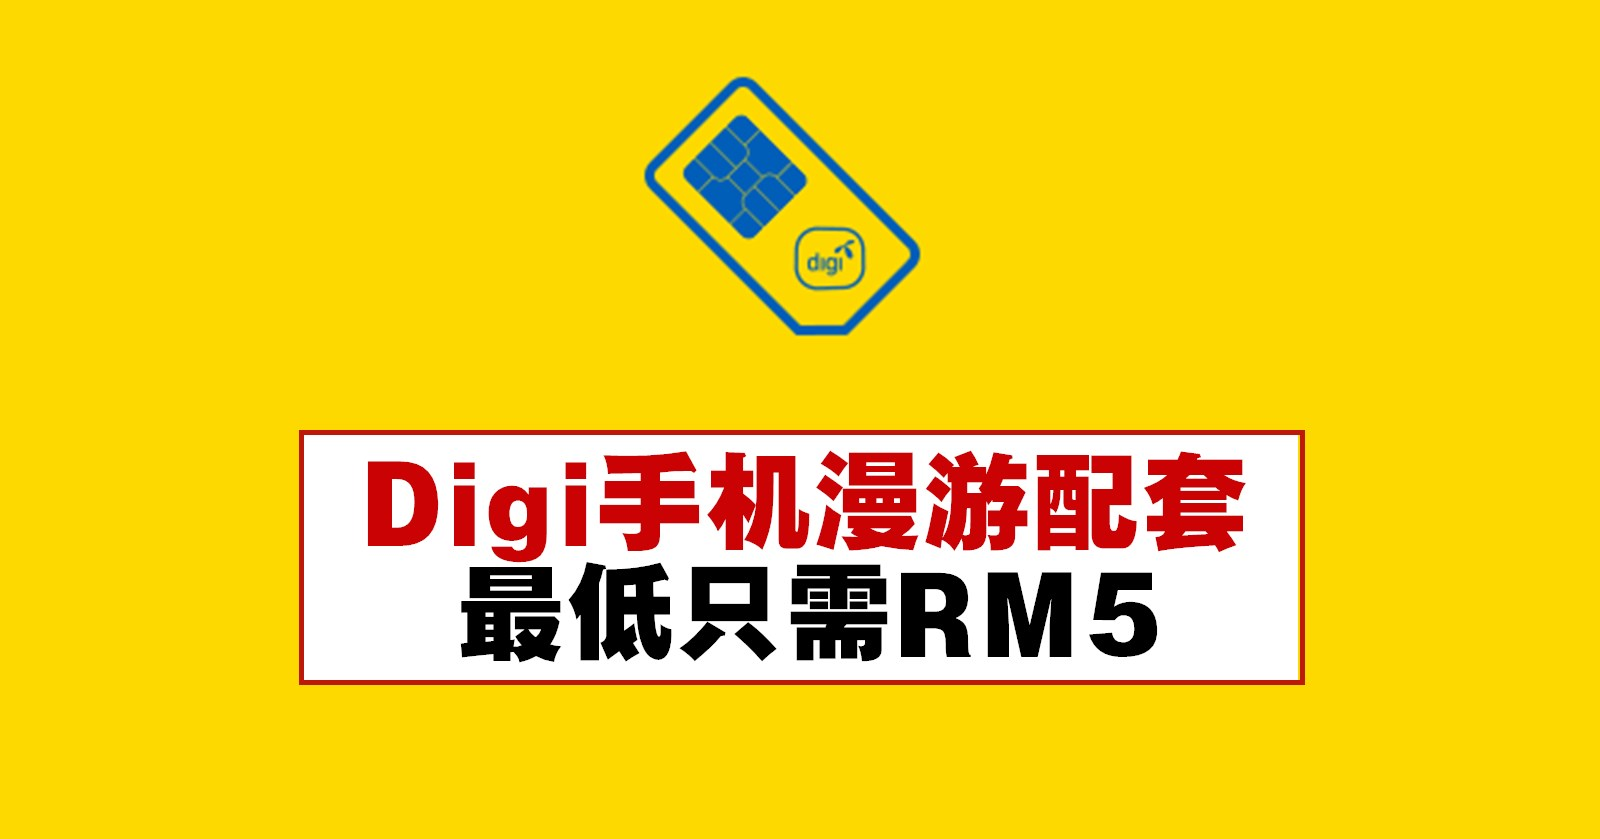 Digi手机漫游配套,最低只需RM5